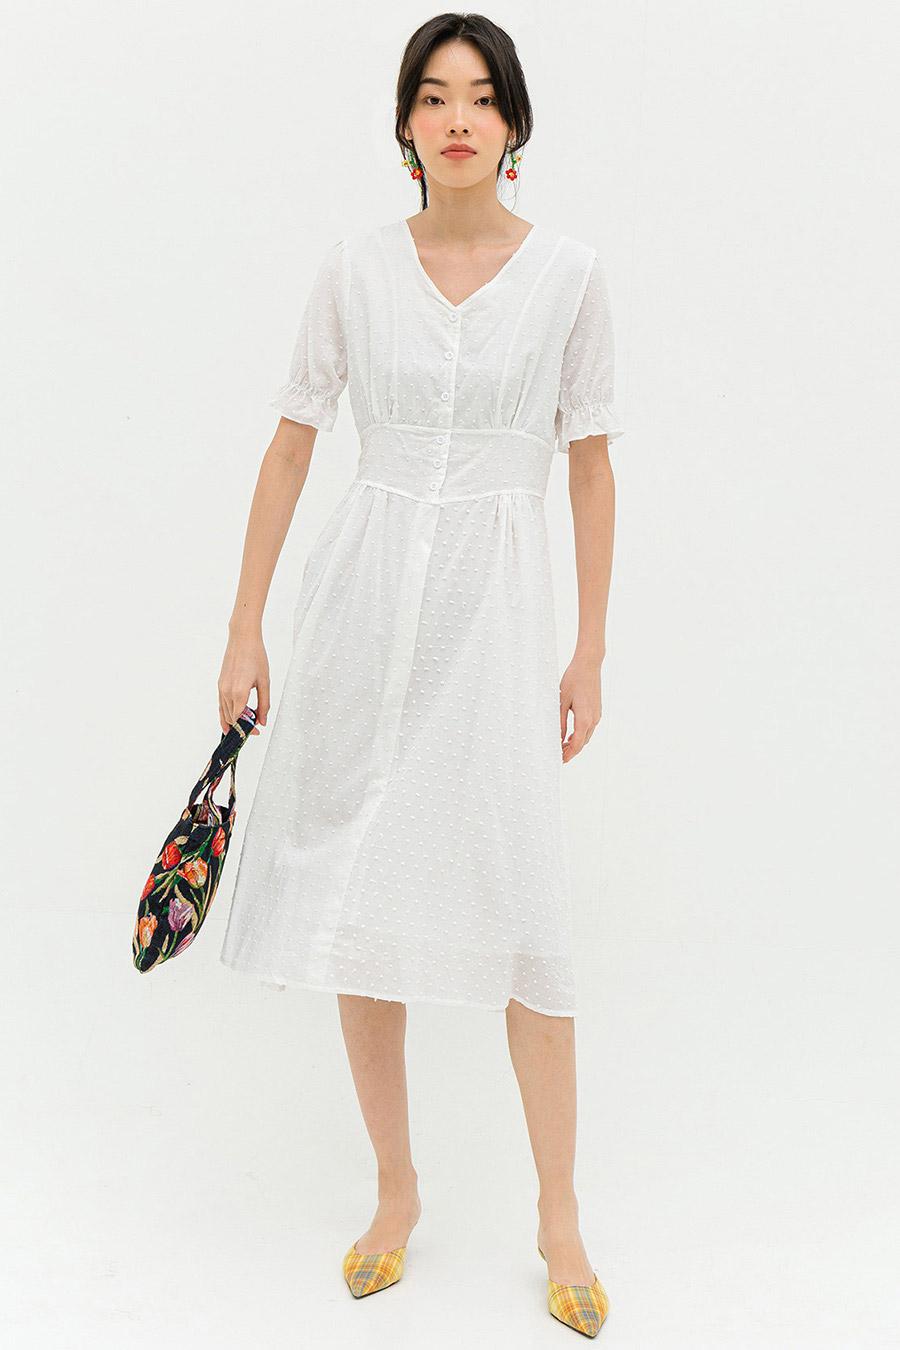 JASMIN DRESS - IVORY